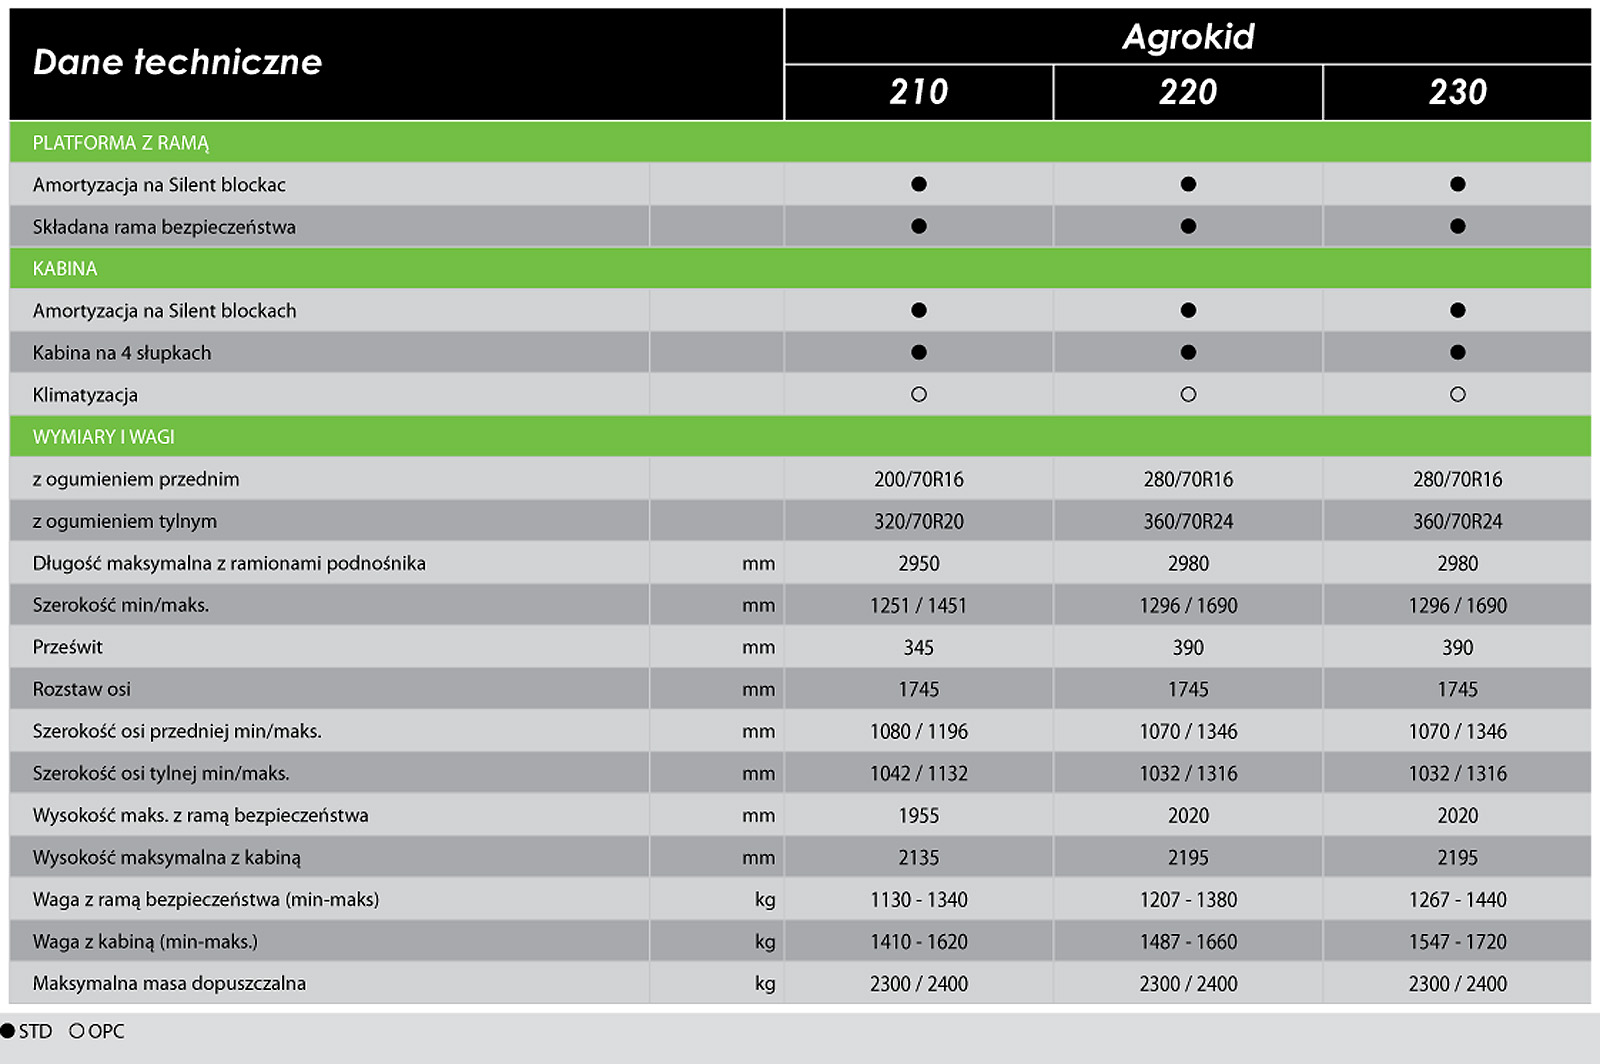 dane techniczne AK